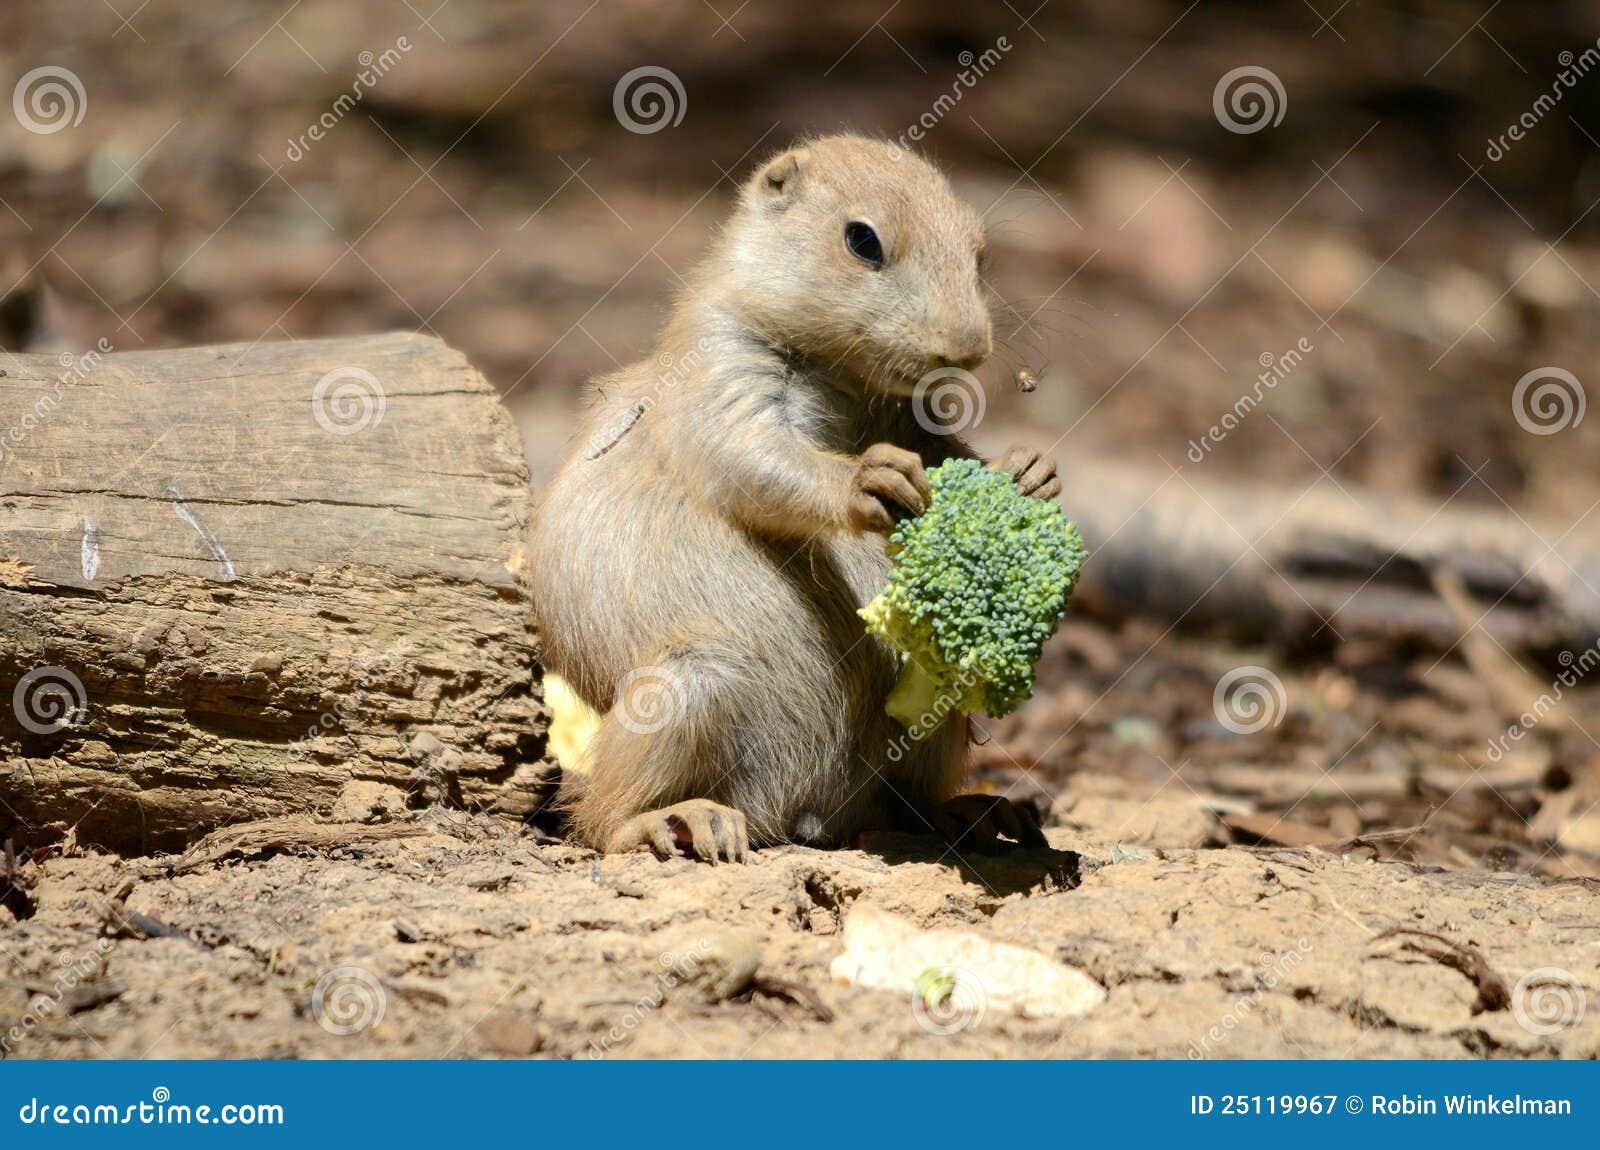 Prairie Dog Eating Broccoli